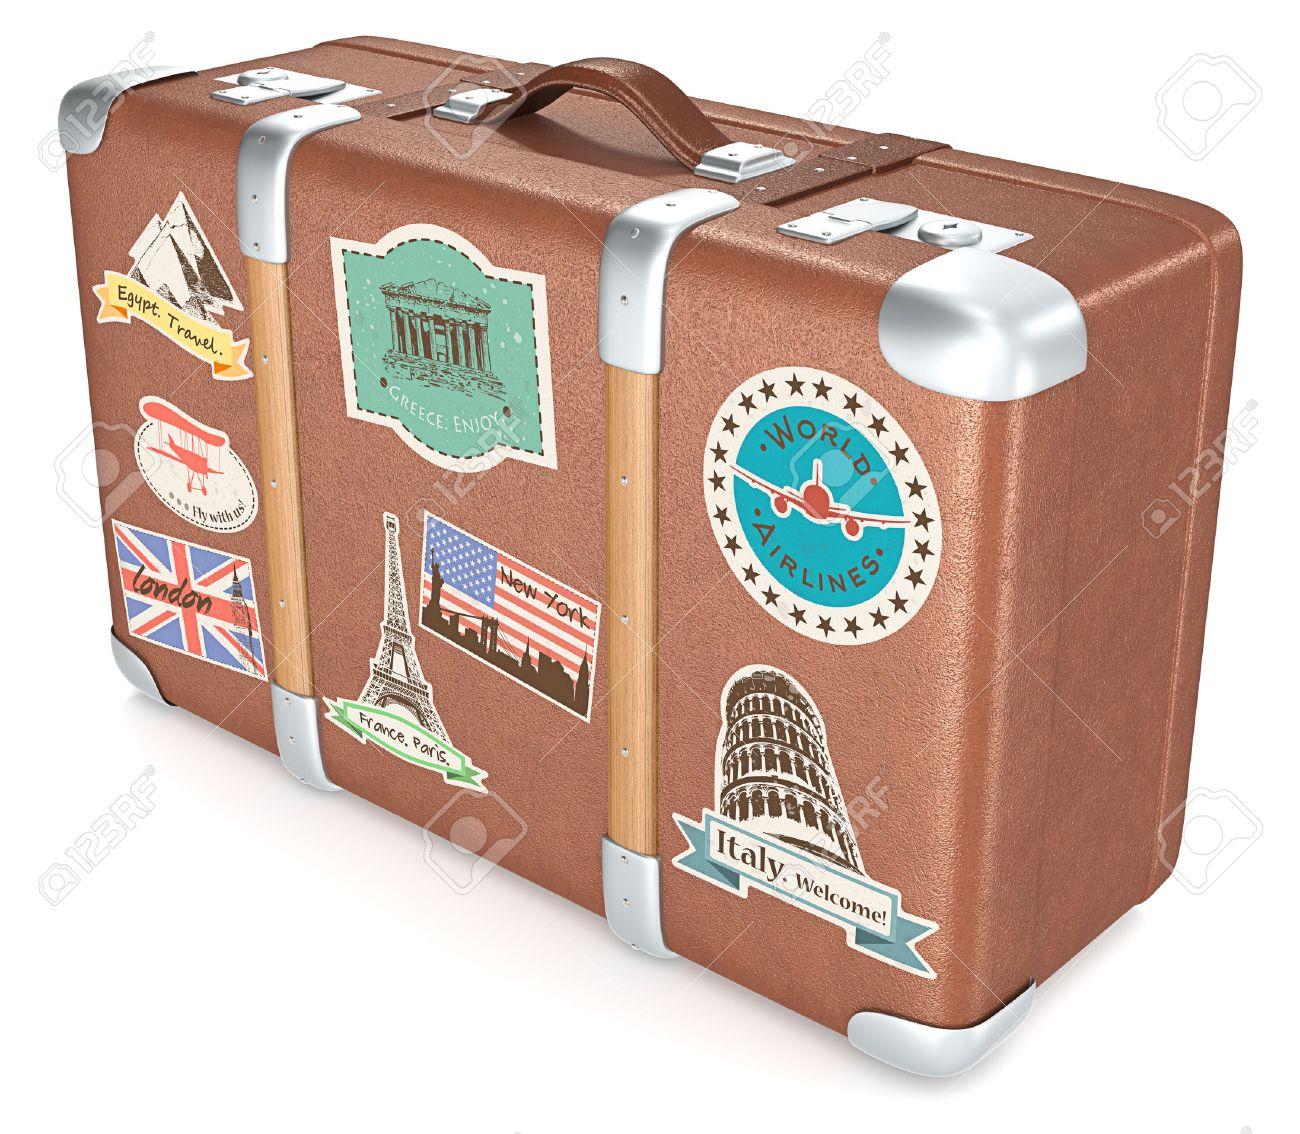 Vintage Suitcase. Leather suitcase with retro travel stickers. Standard-Bild - 39986657